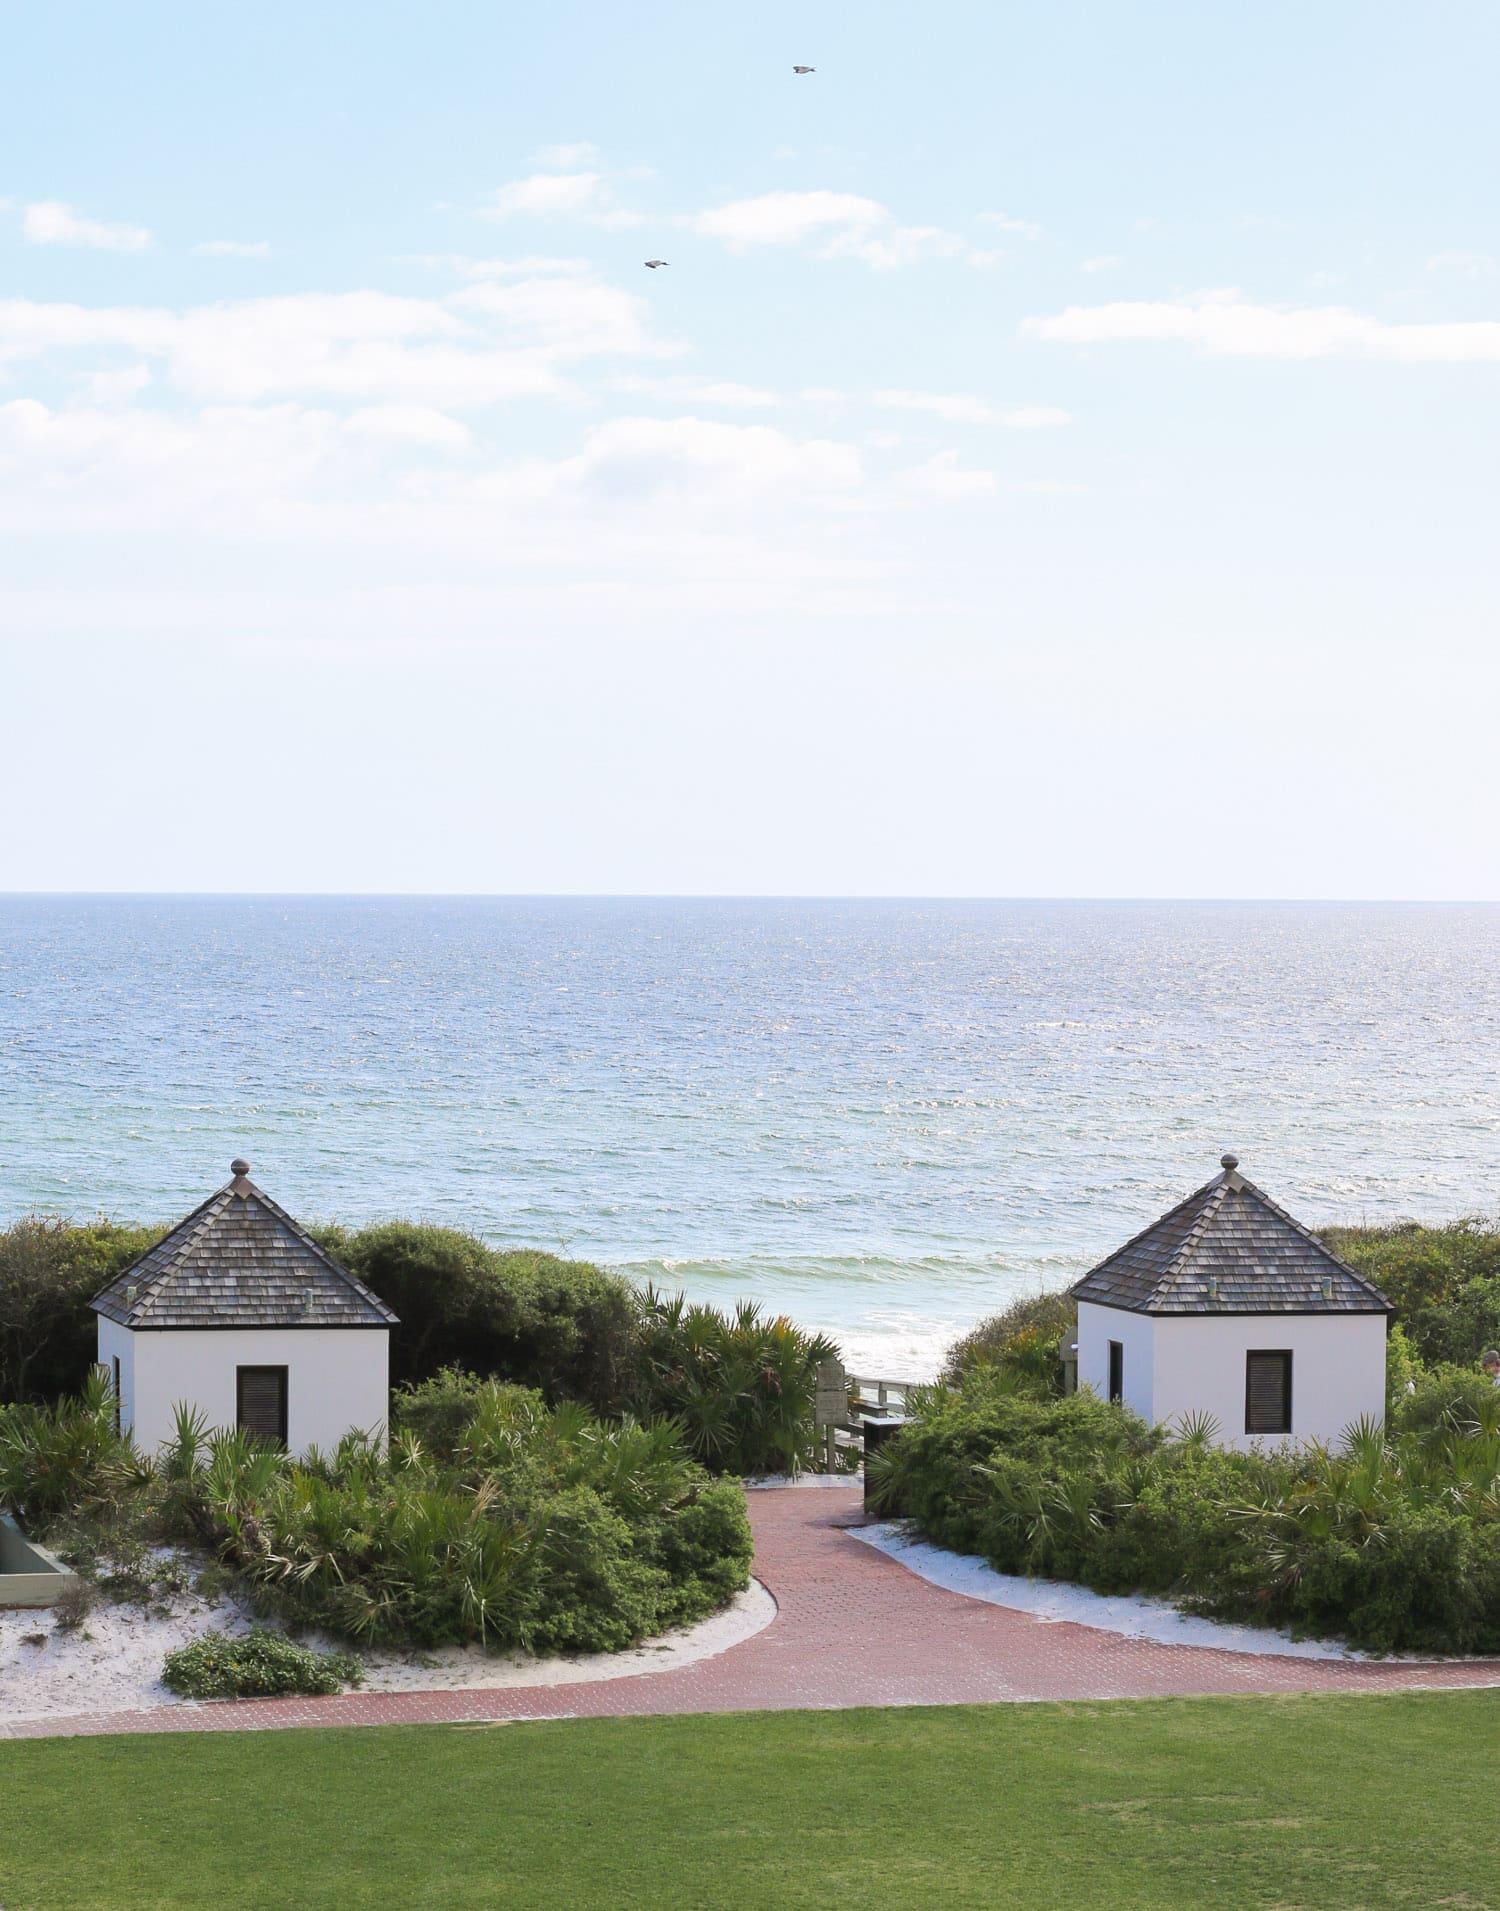 the-pearl-hotel-rosemary-beach-florida-0451